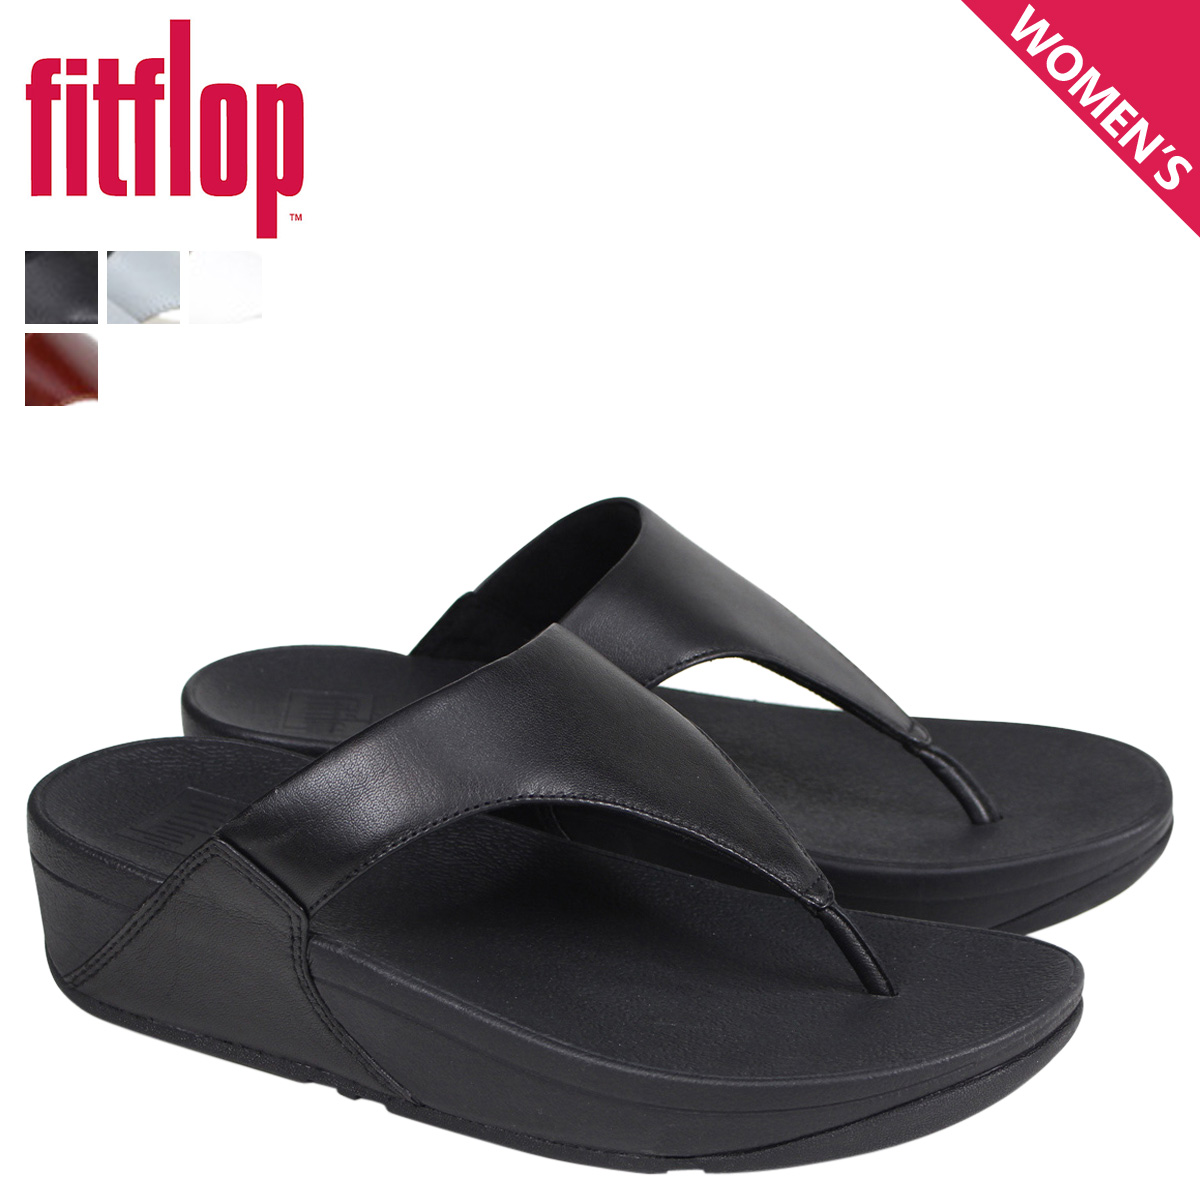 cff380f13 FitFlop sandals fitting FLOP Lulu LULU LEATHER TOE POST SANDALS Lady s I88  black gray brown  4 4 Shinnyu load